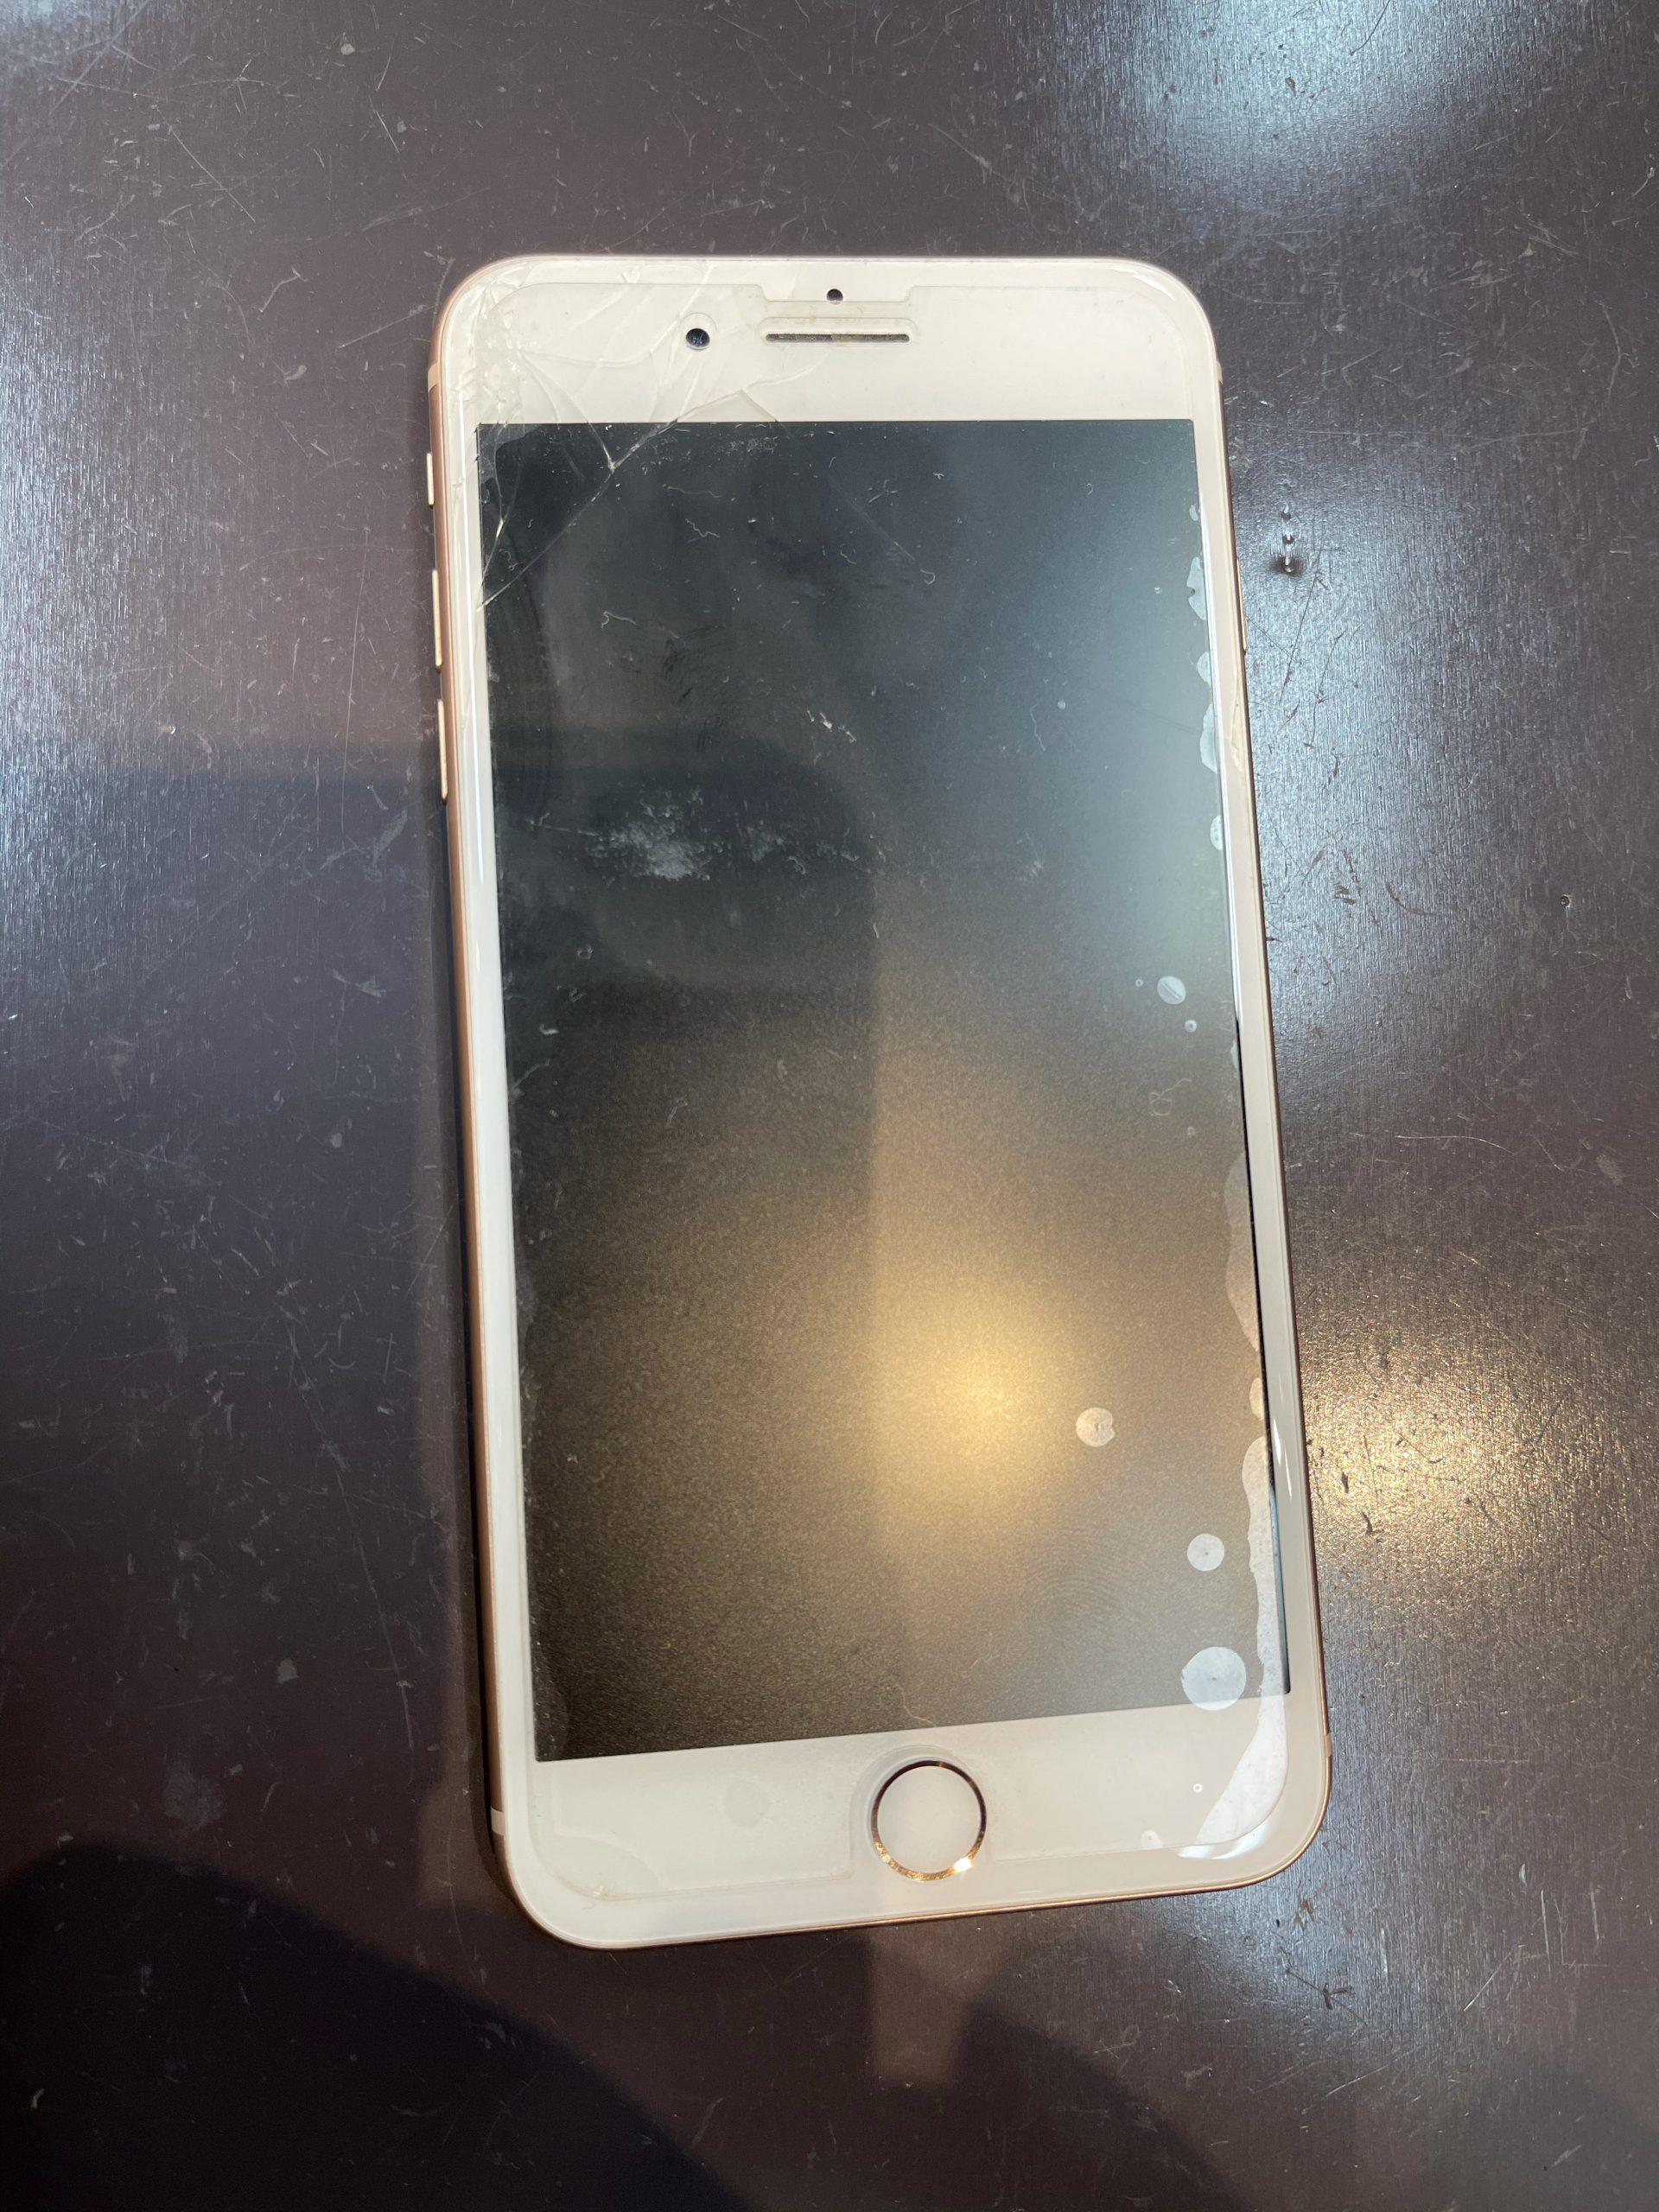 【iPhone8+】画面割れしました。〈佐賀市よりご来店〉